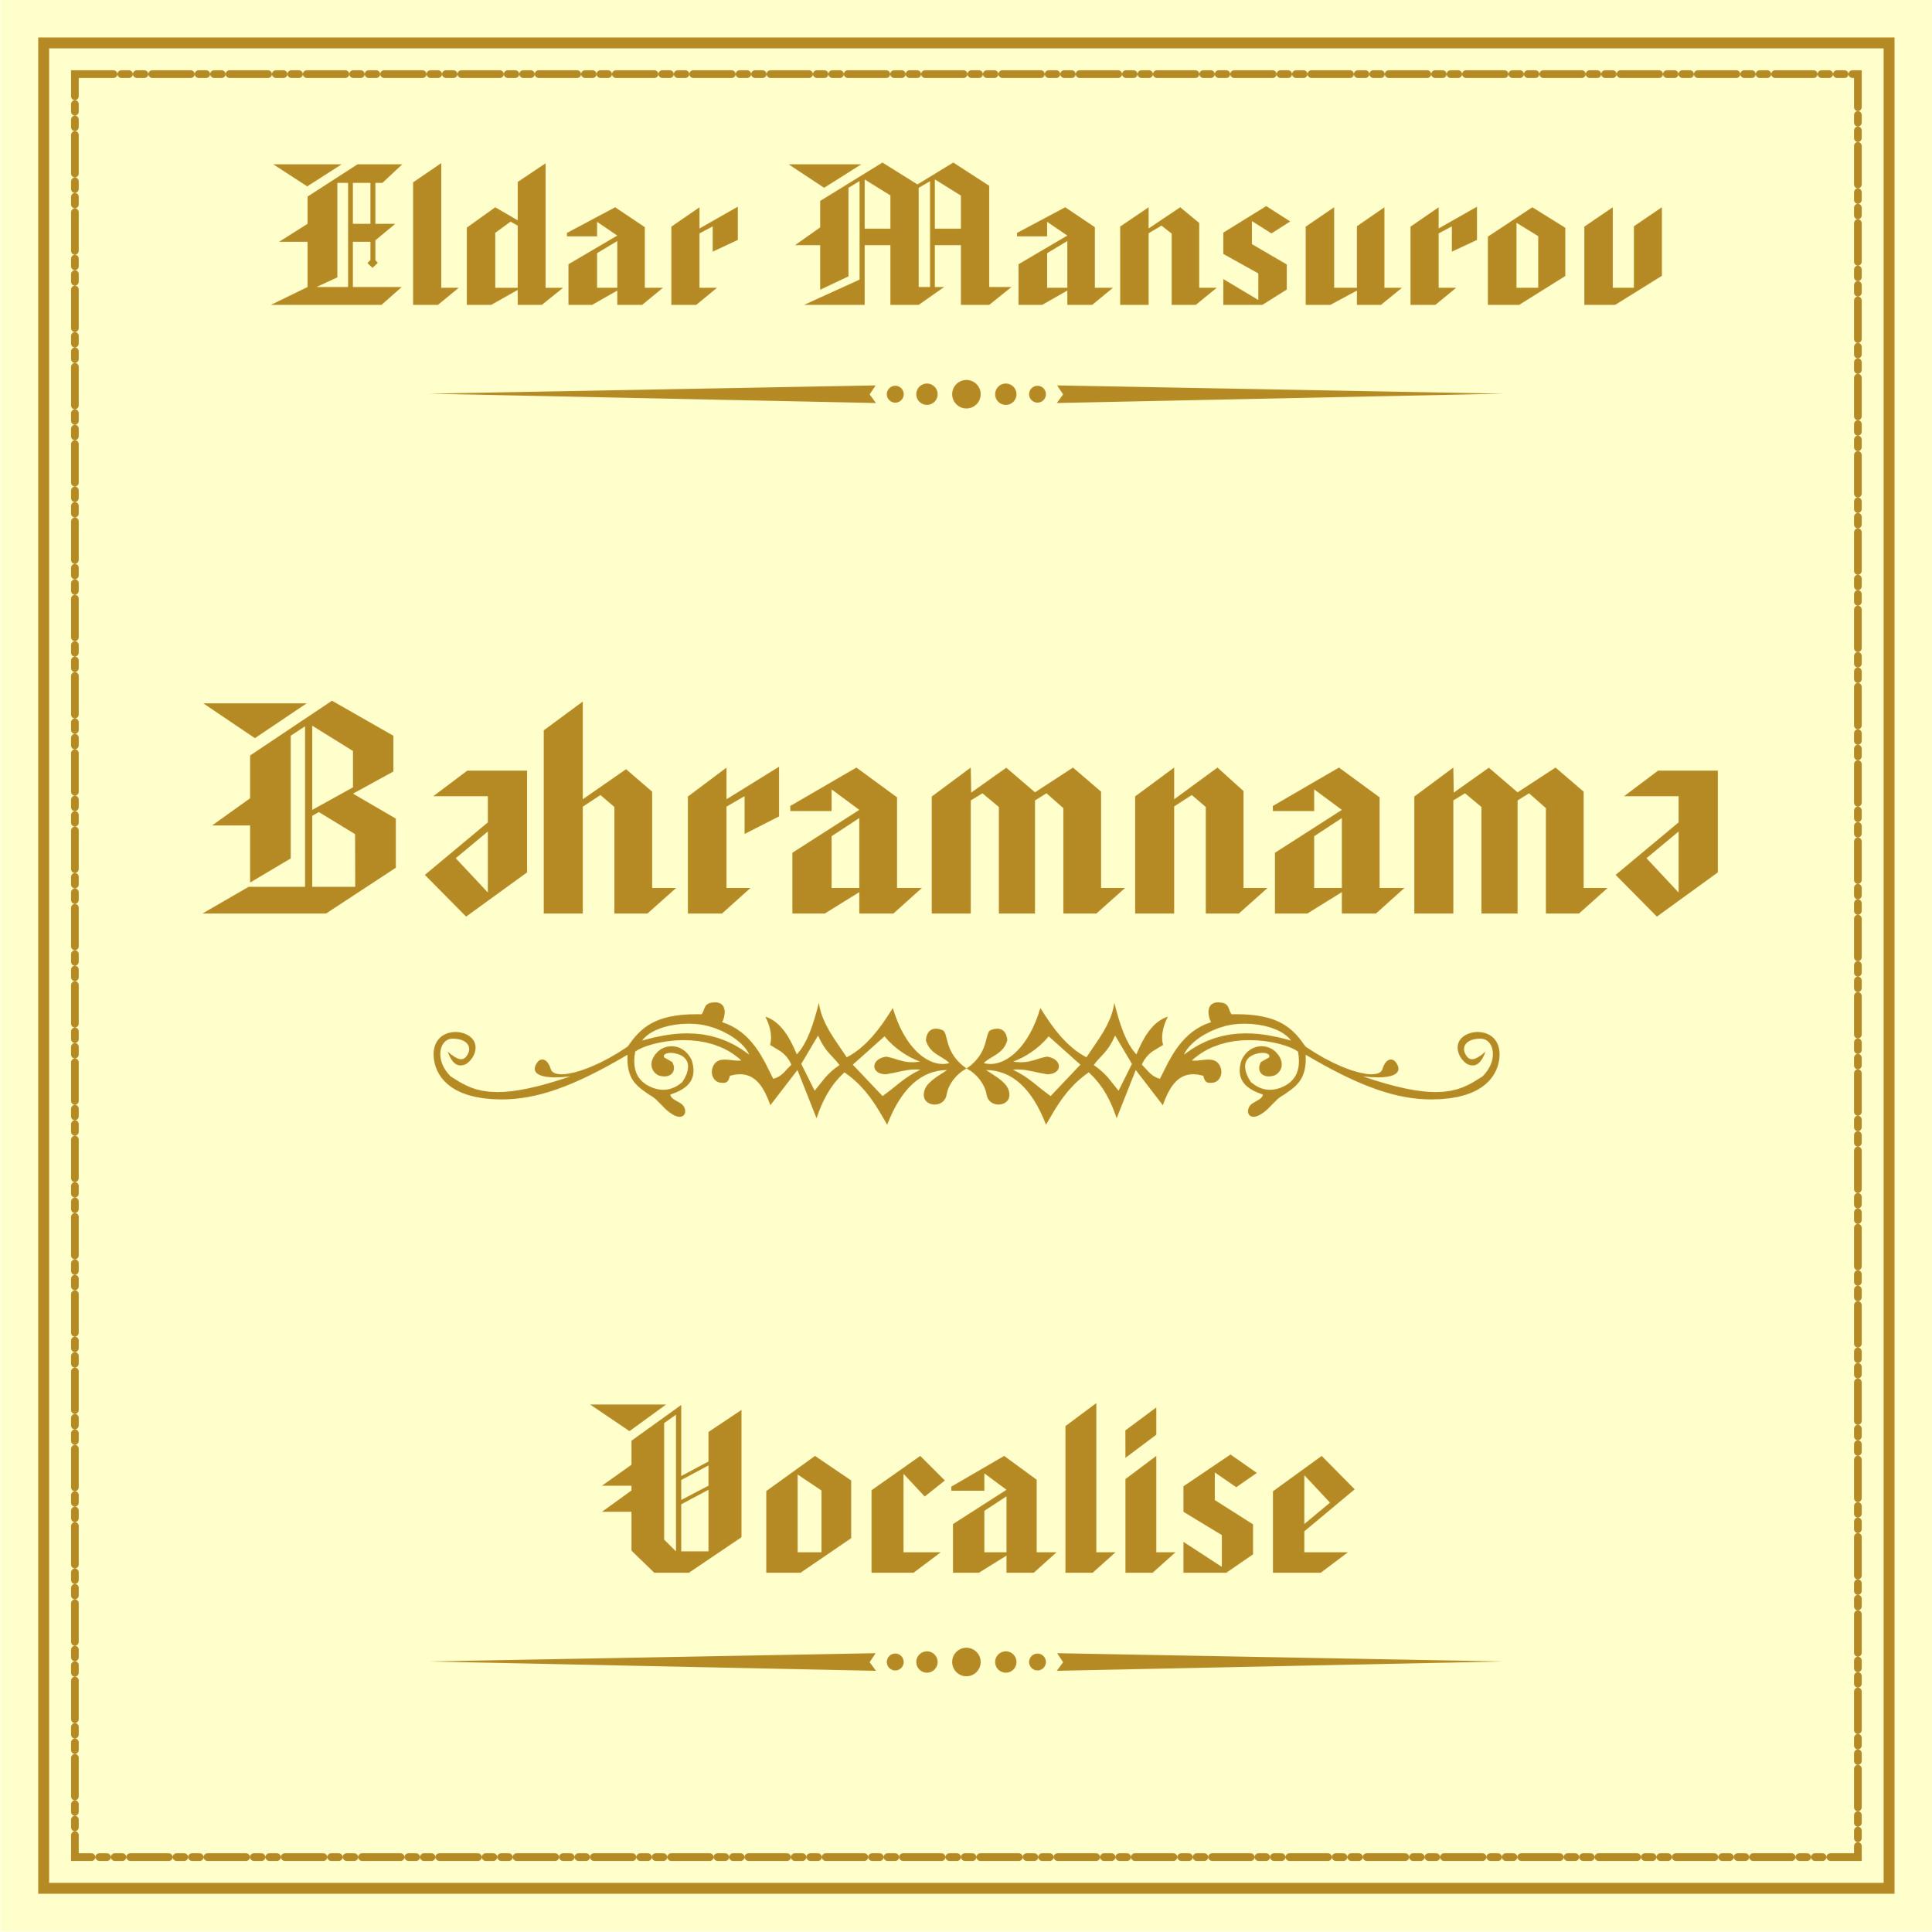 Bahramnameh. Vocalise